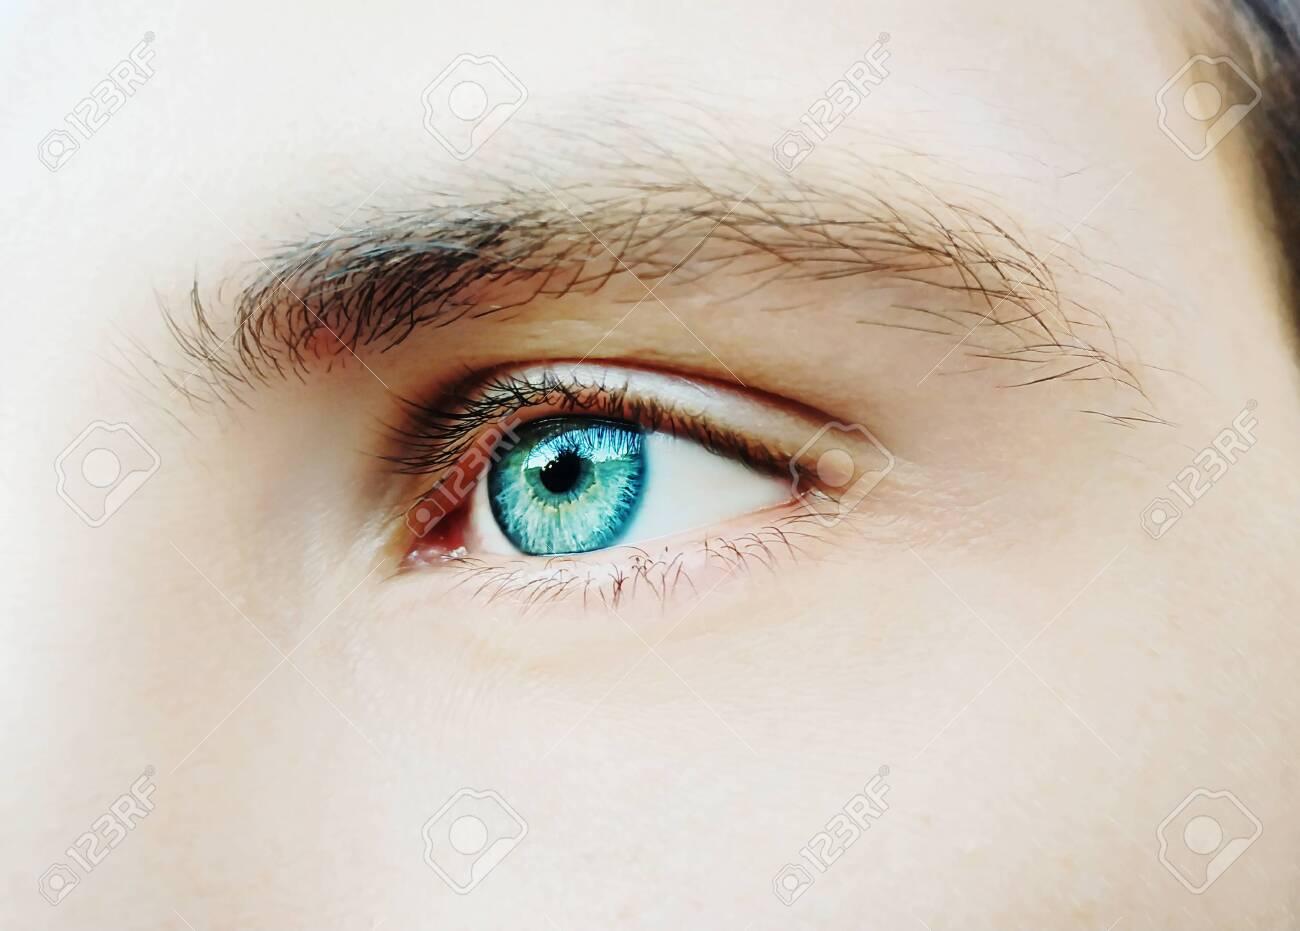 A beautiful insightful look man's eye. Close up shot - 139339987